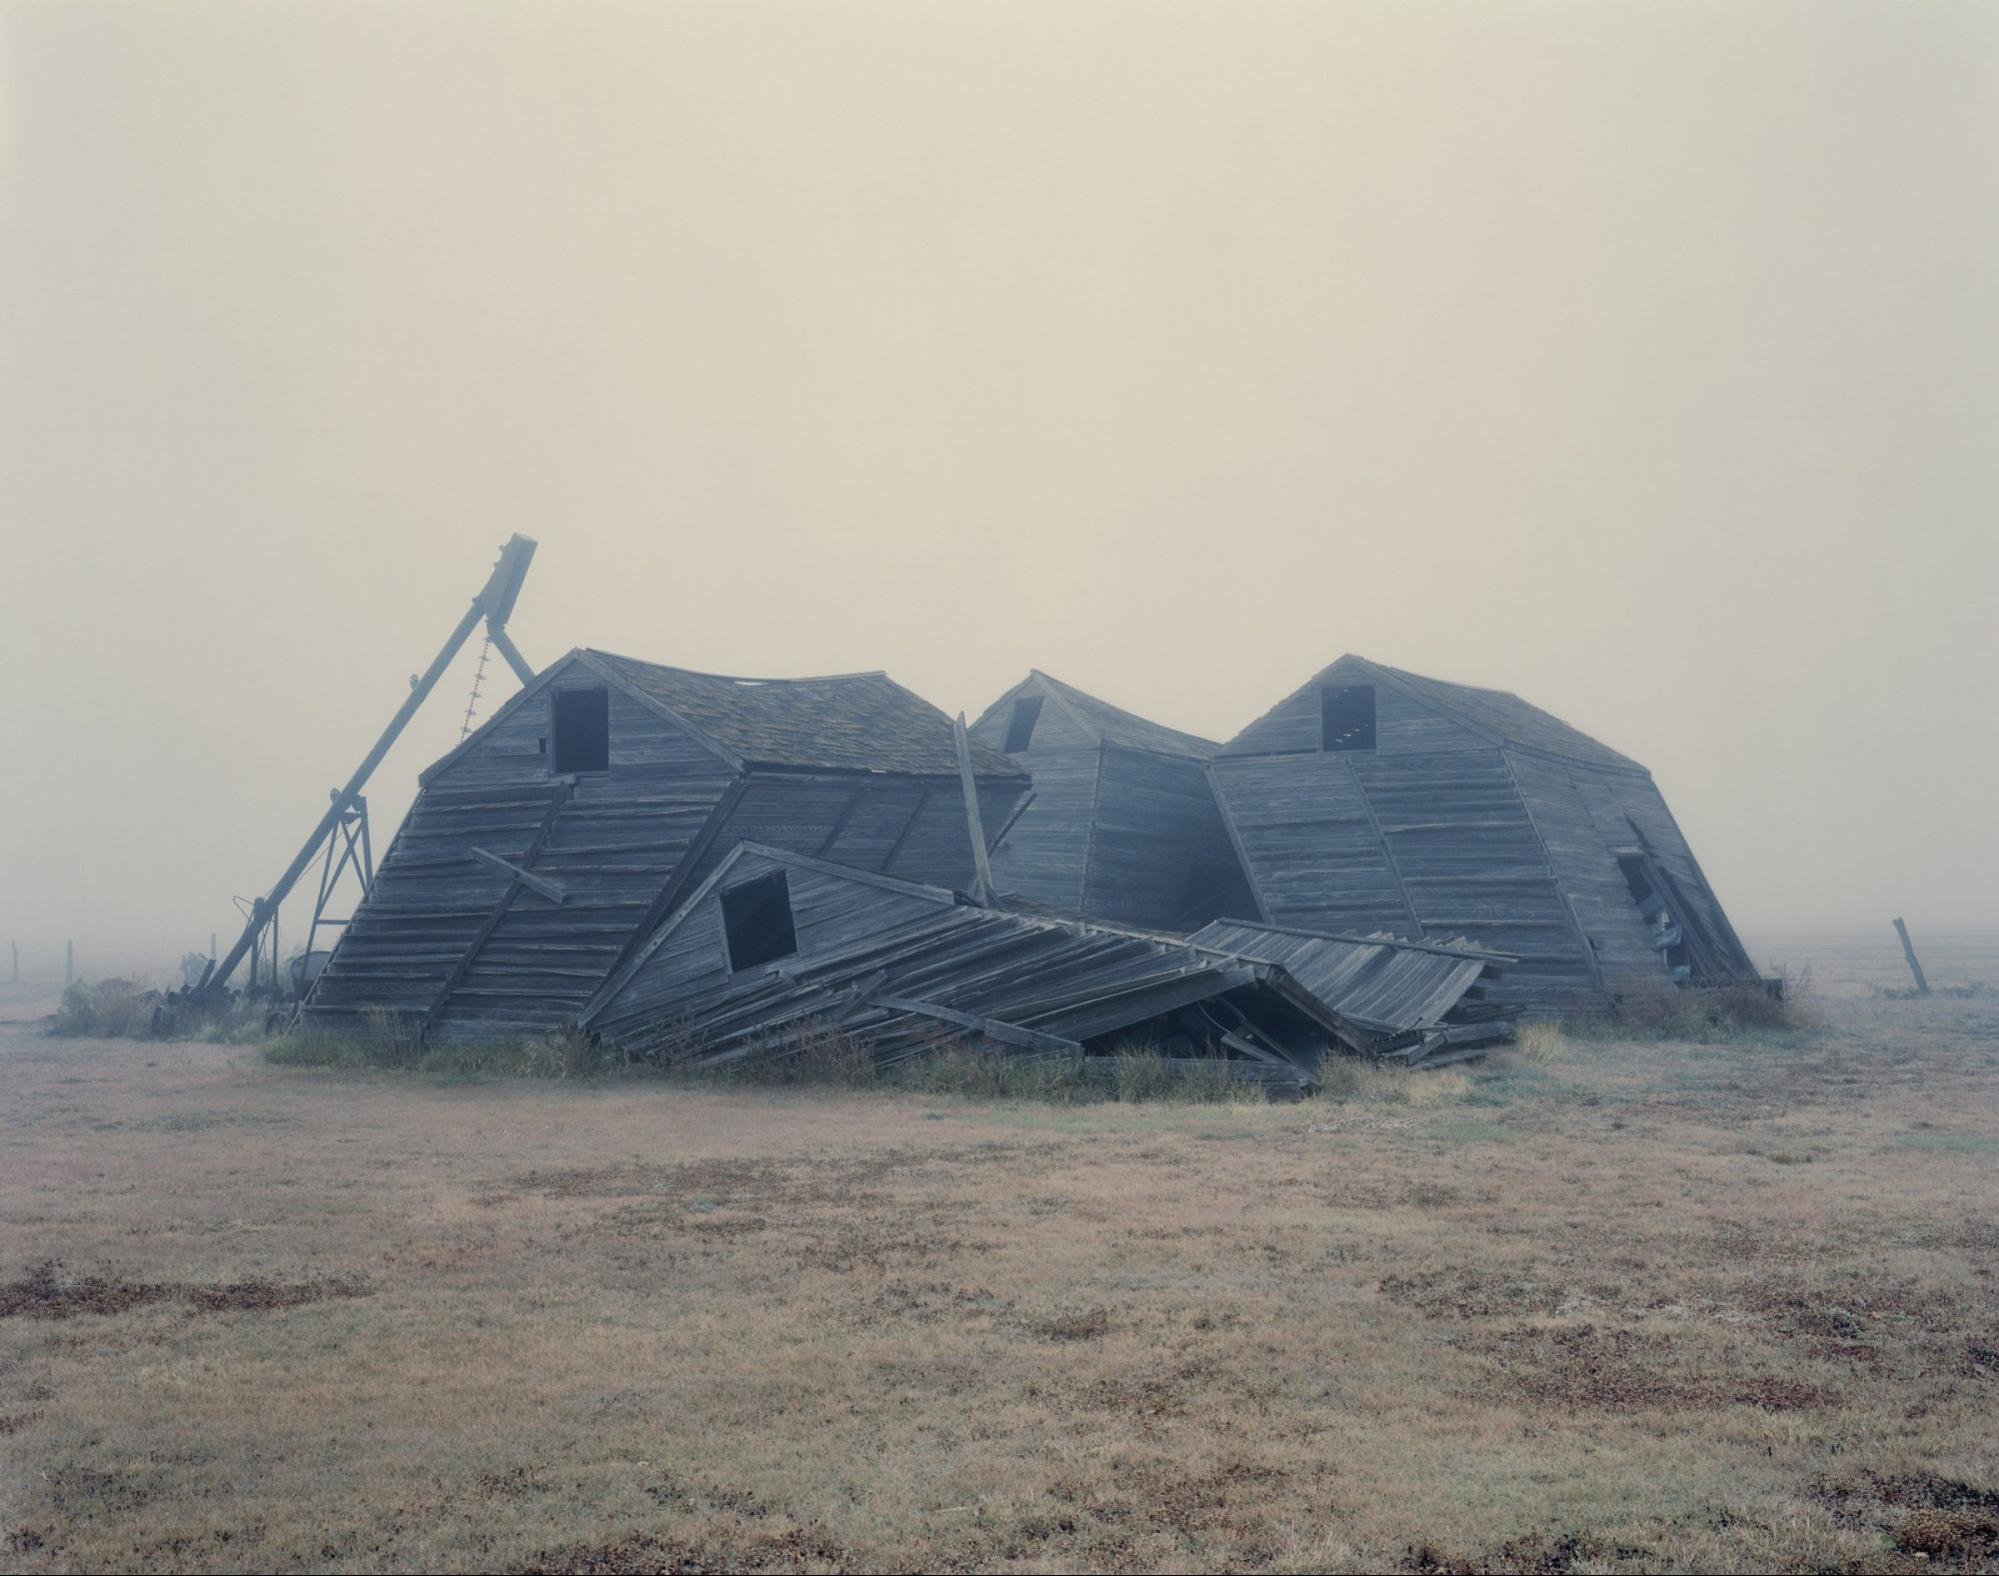 Crumpled Barns, Texas, 1995 photograph by Nadav Kander